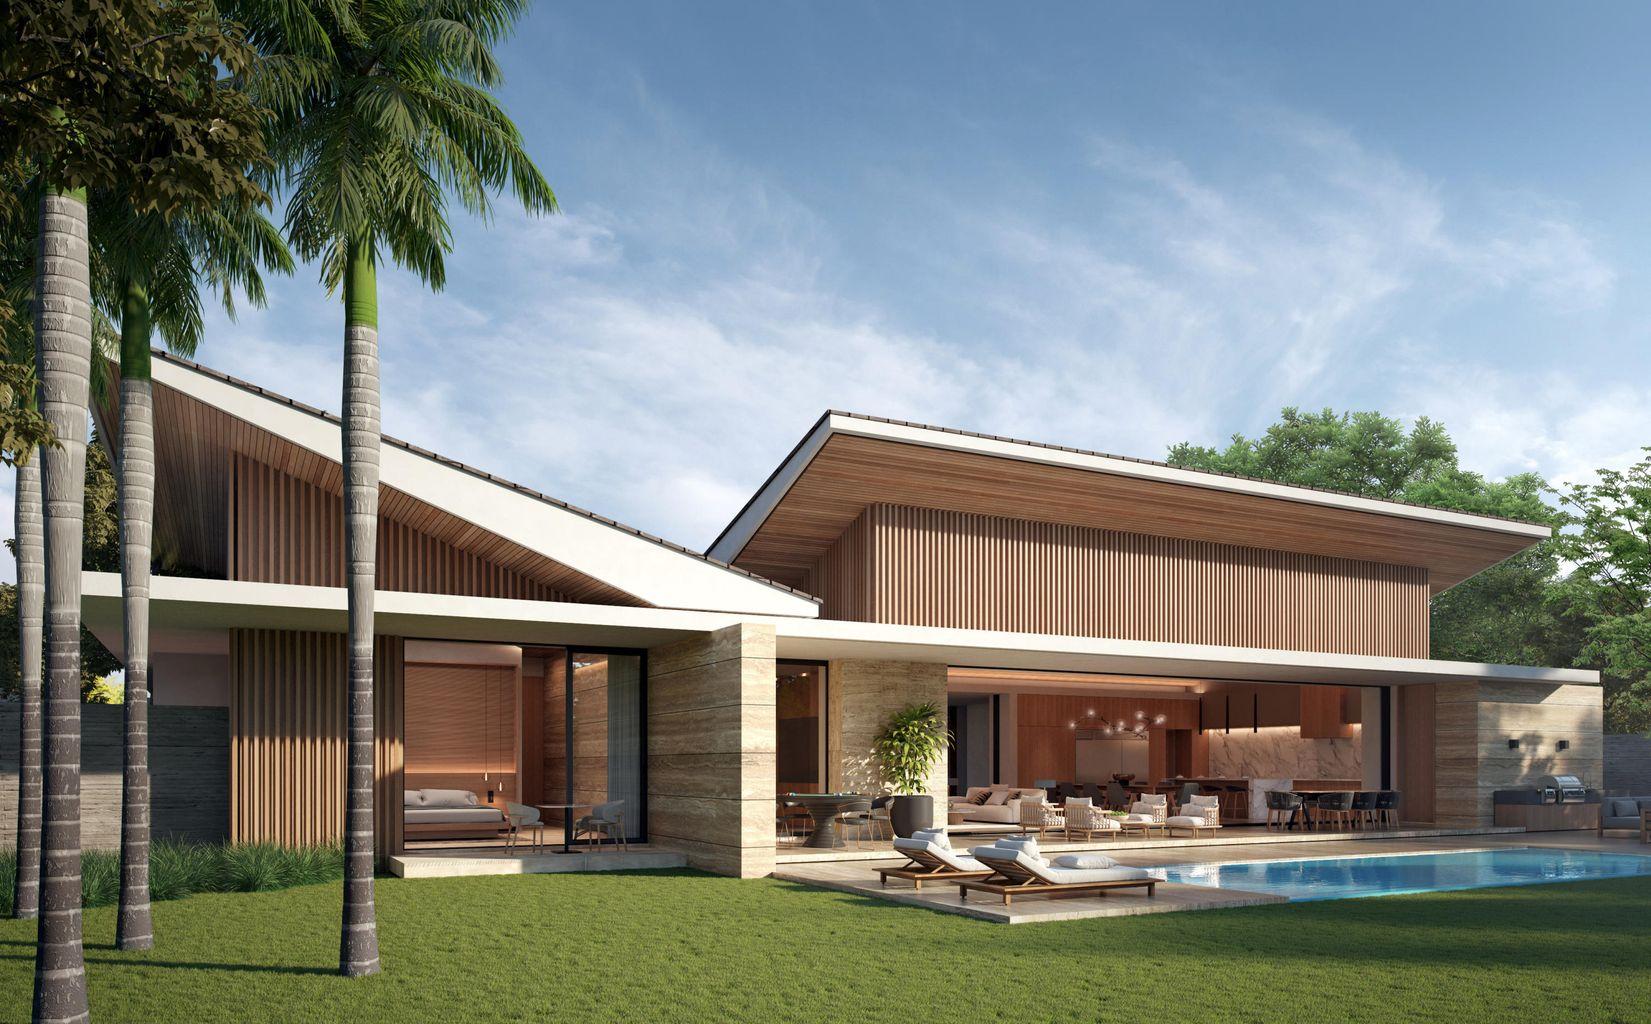 Award Winning Design at Villas at Flamboyanes nestled between 2 park – Ready by Autumn 2022